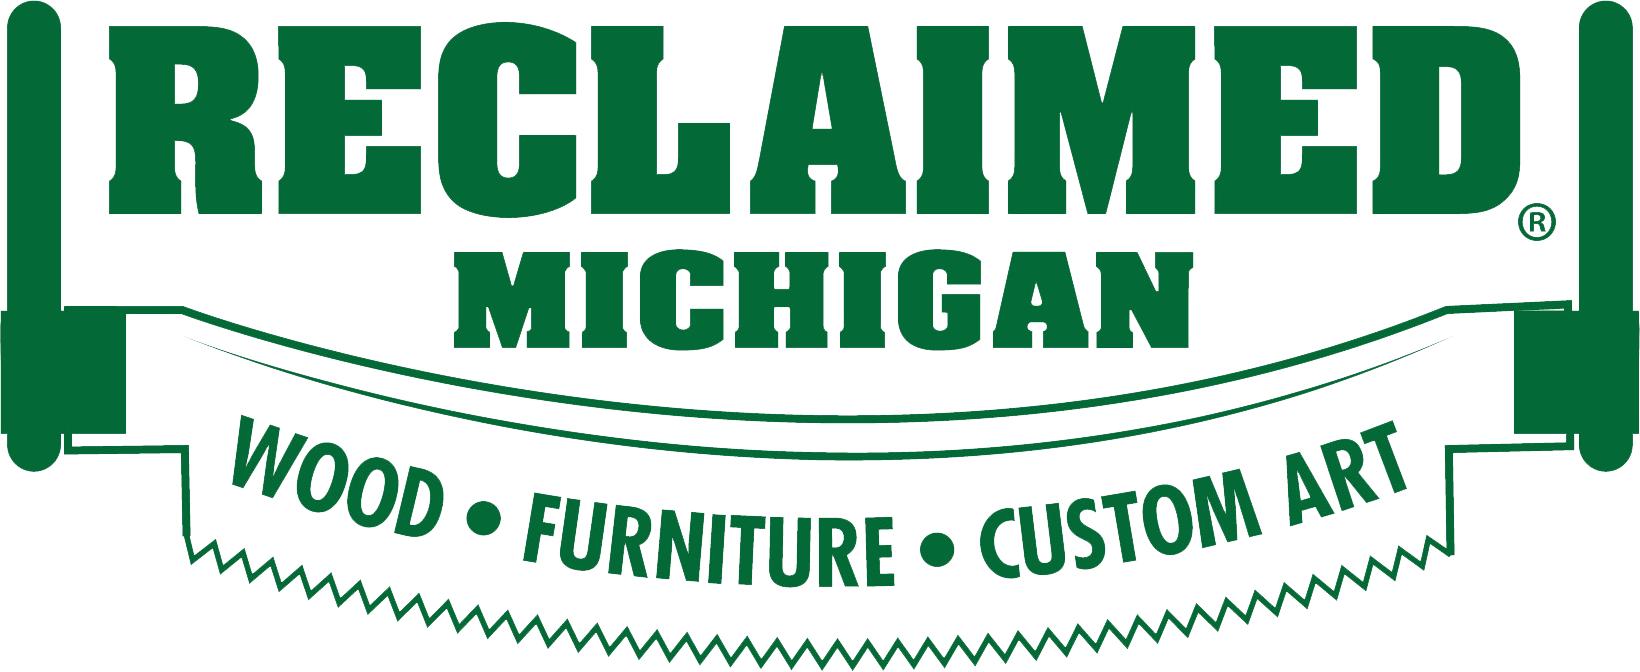 Reclaimed Michigan